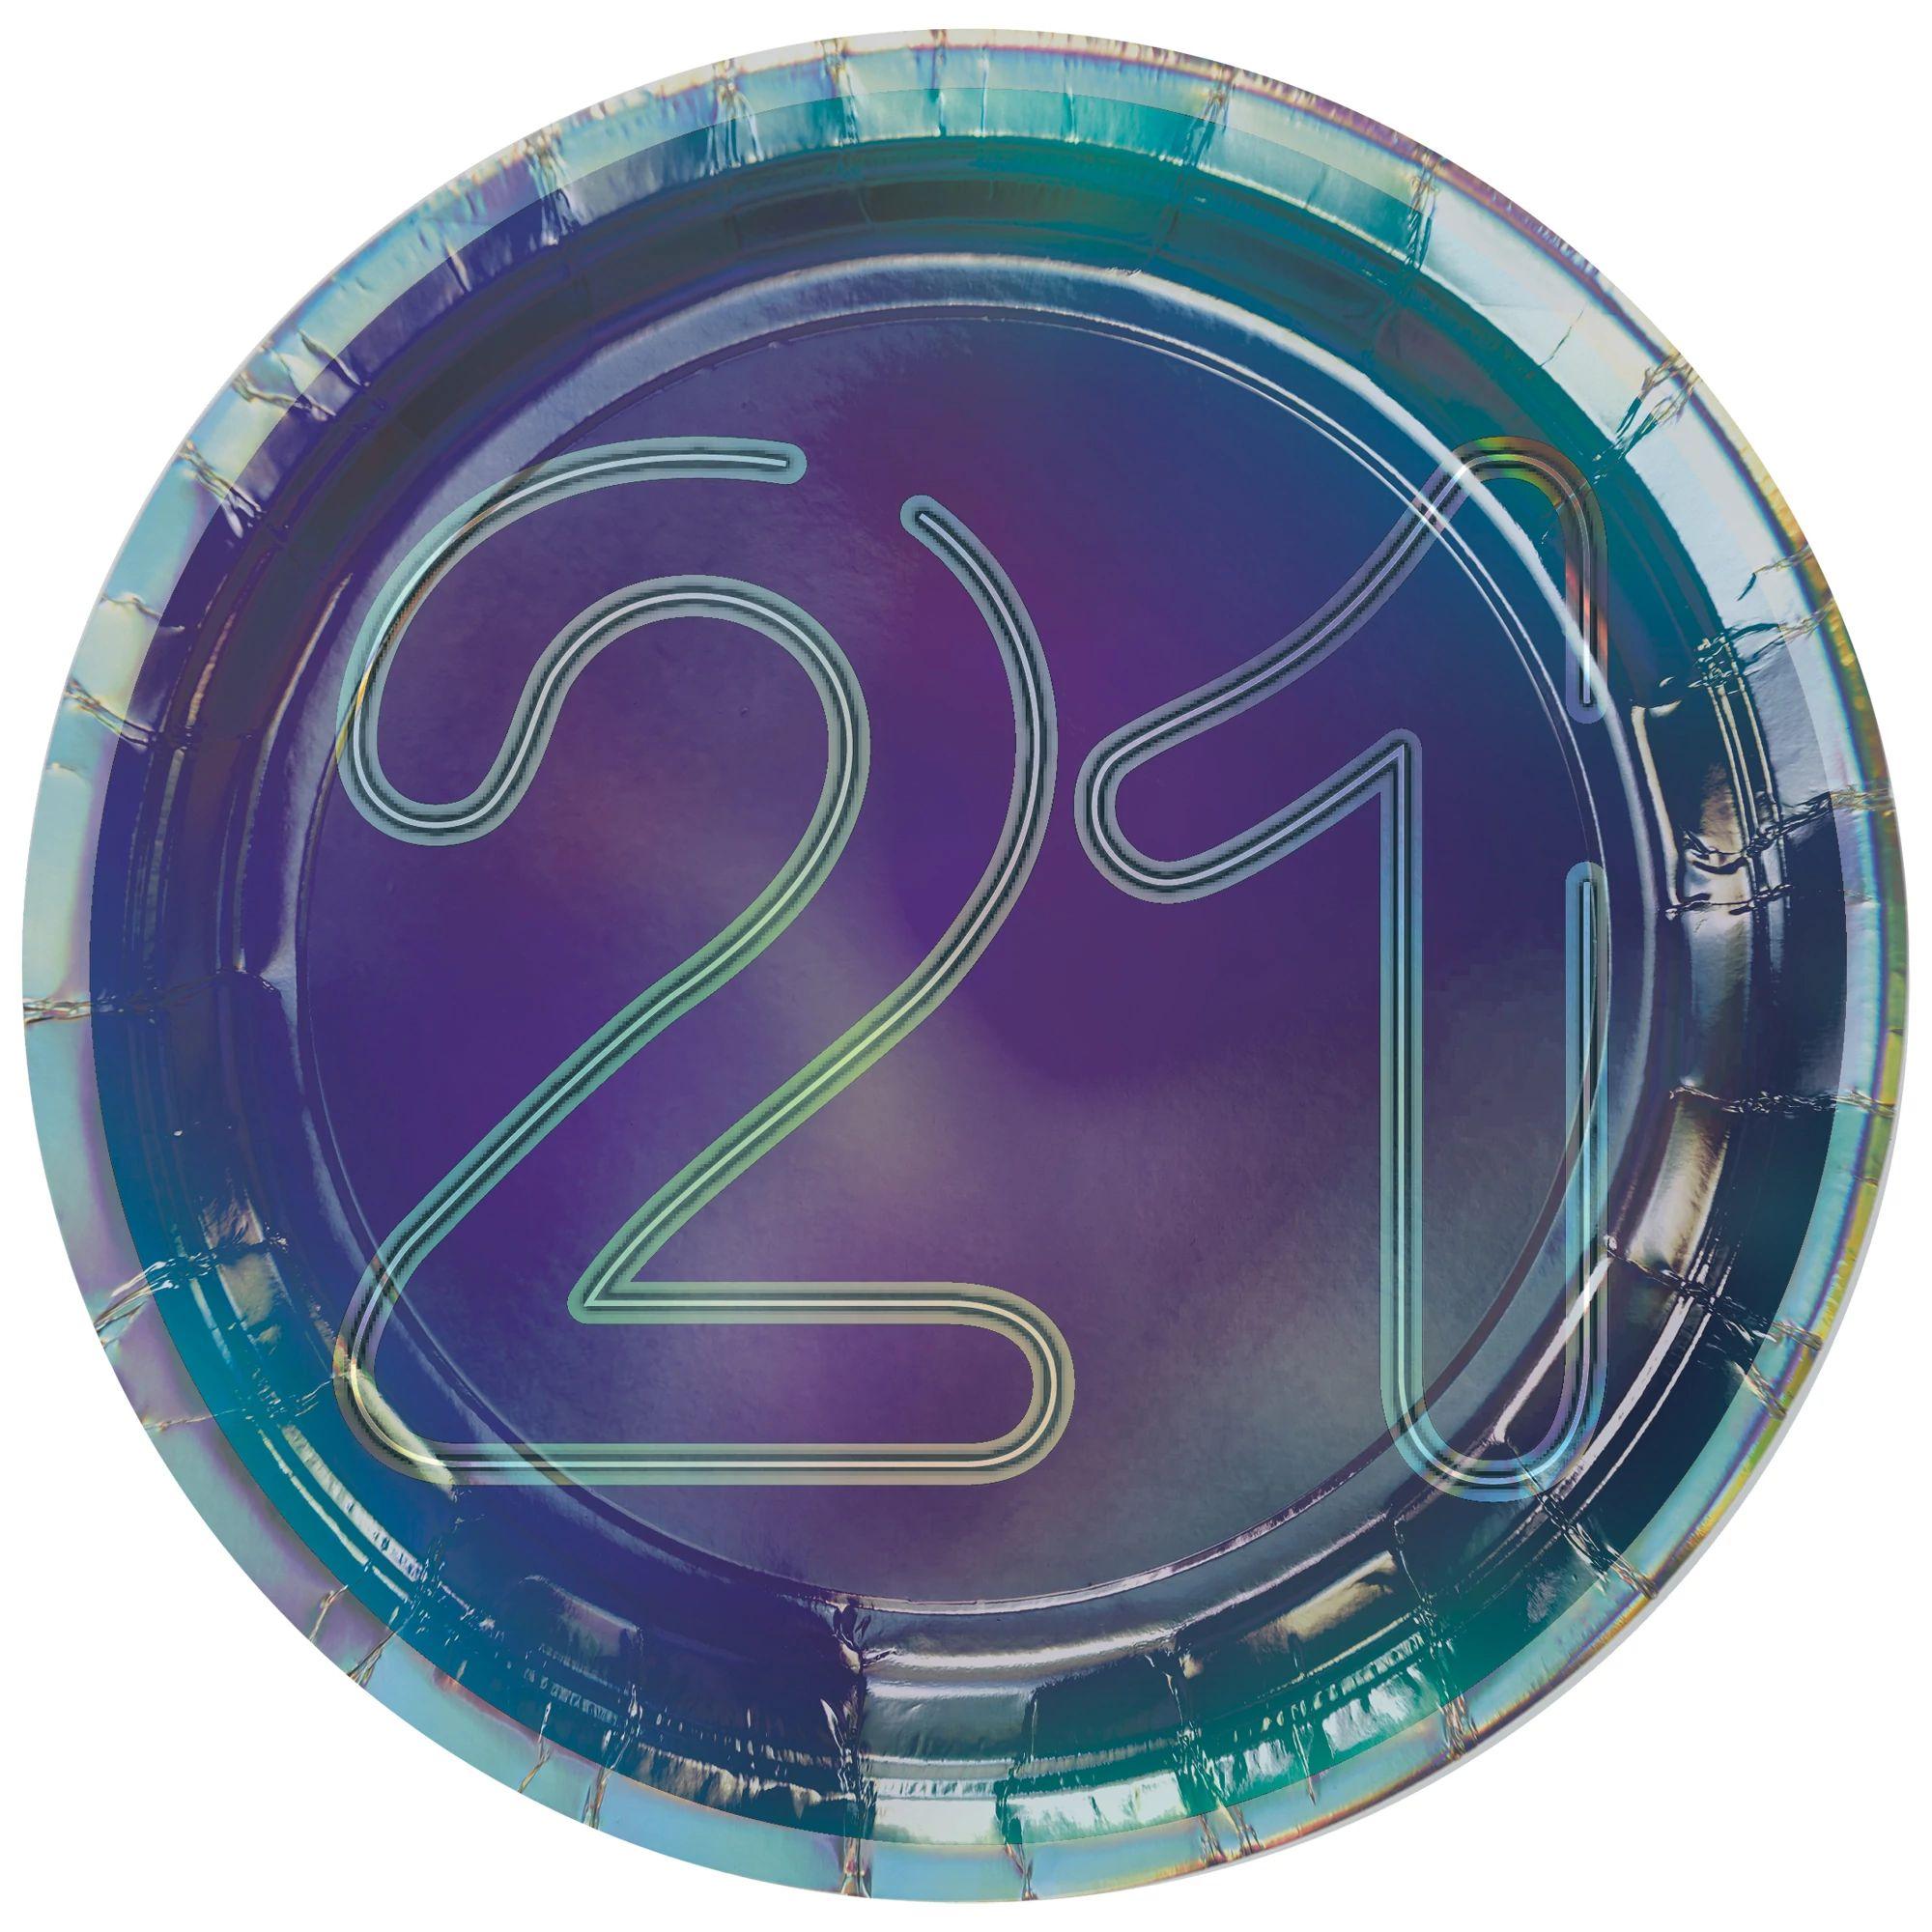 Finally 21 7